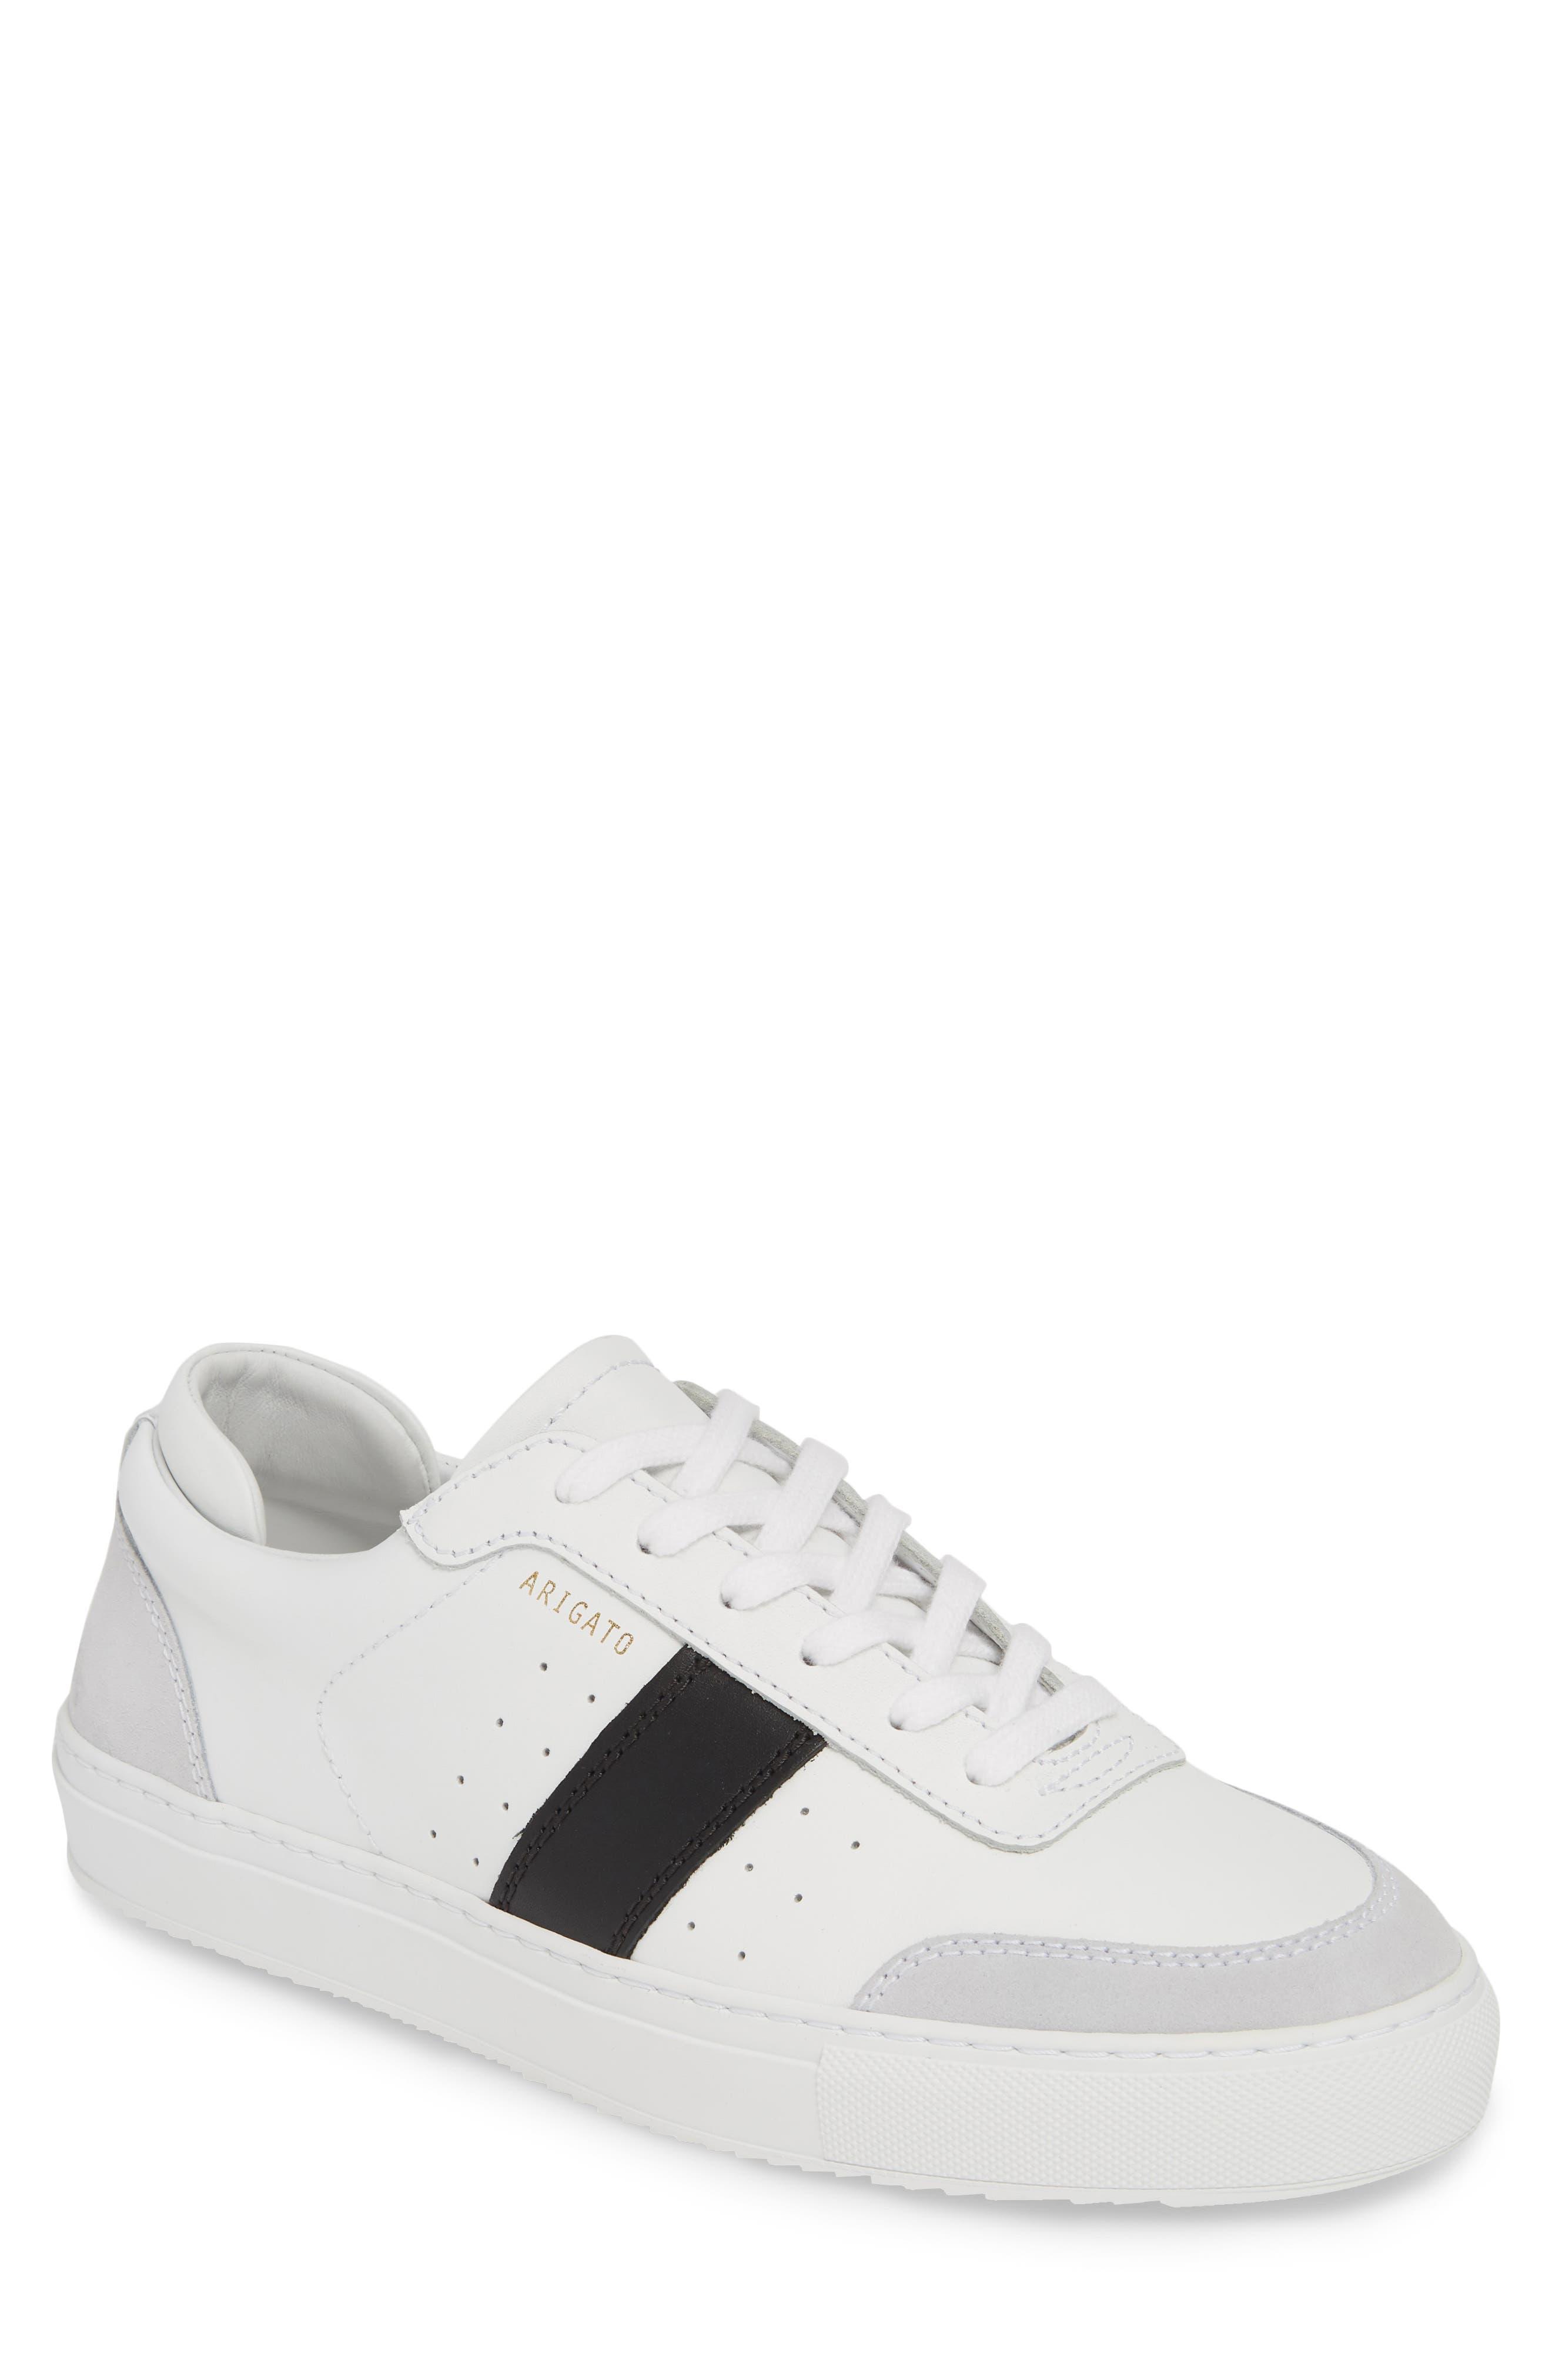 AXEL ARIGATO,                             Dunk Sneaker,                             Main thumbnail 1, color,                             WHITE W/ BLACK STRIPE